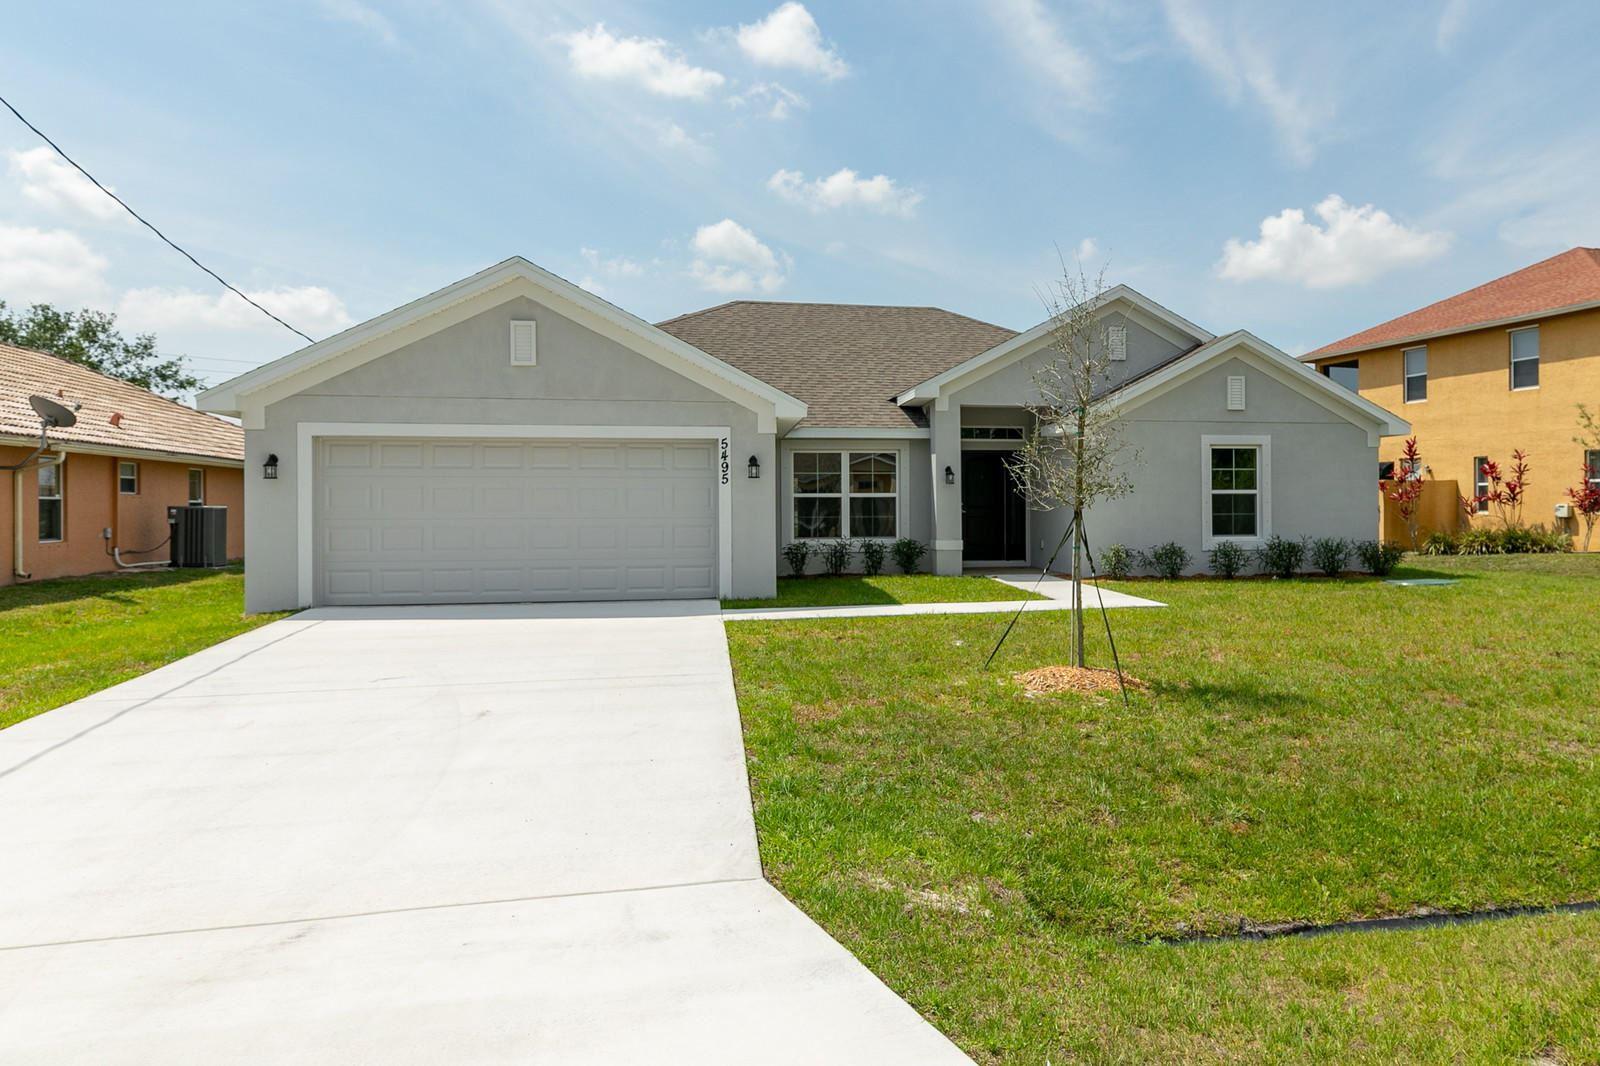 6002 Hickory Drive, Fort Pierce, FL 34982 - #: RX-10727512